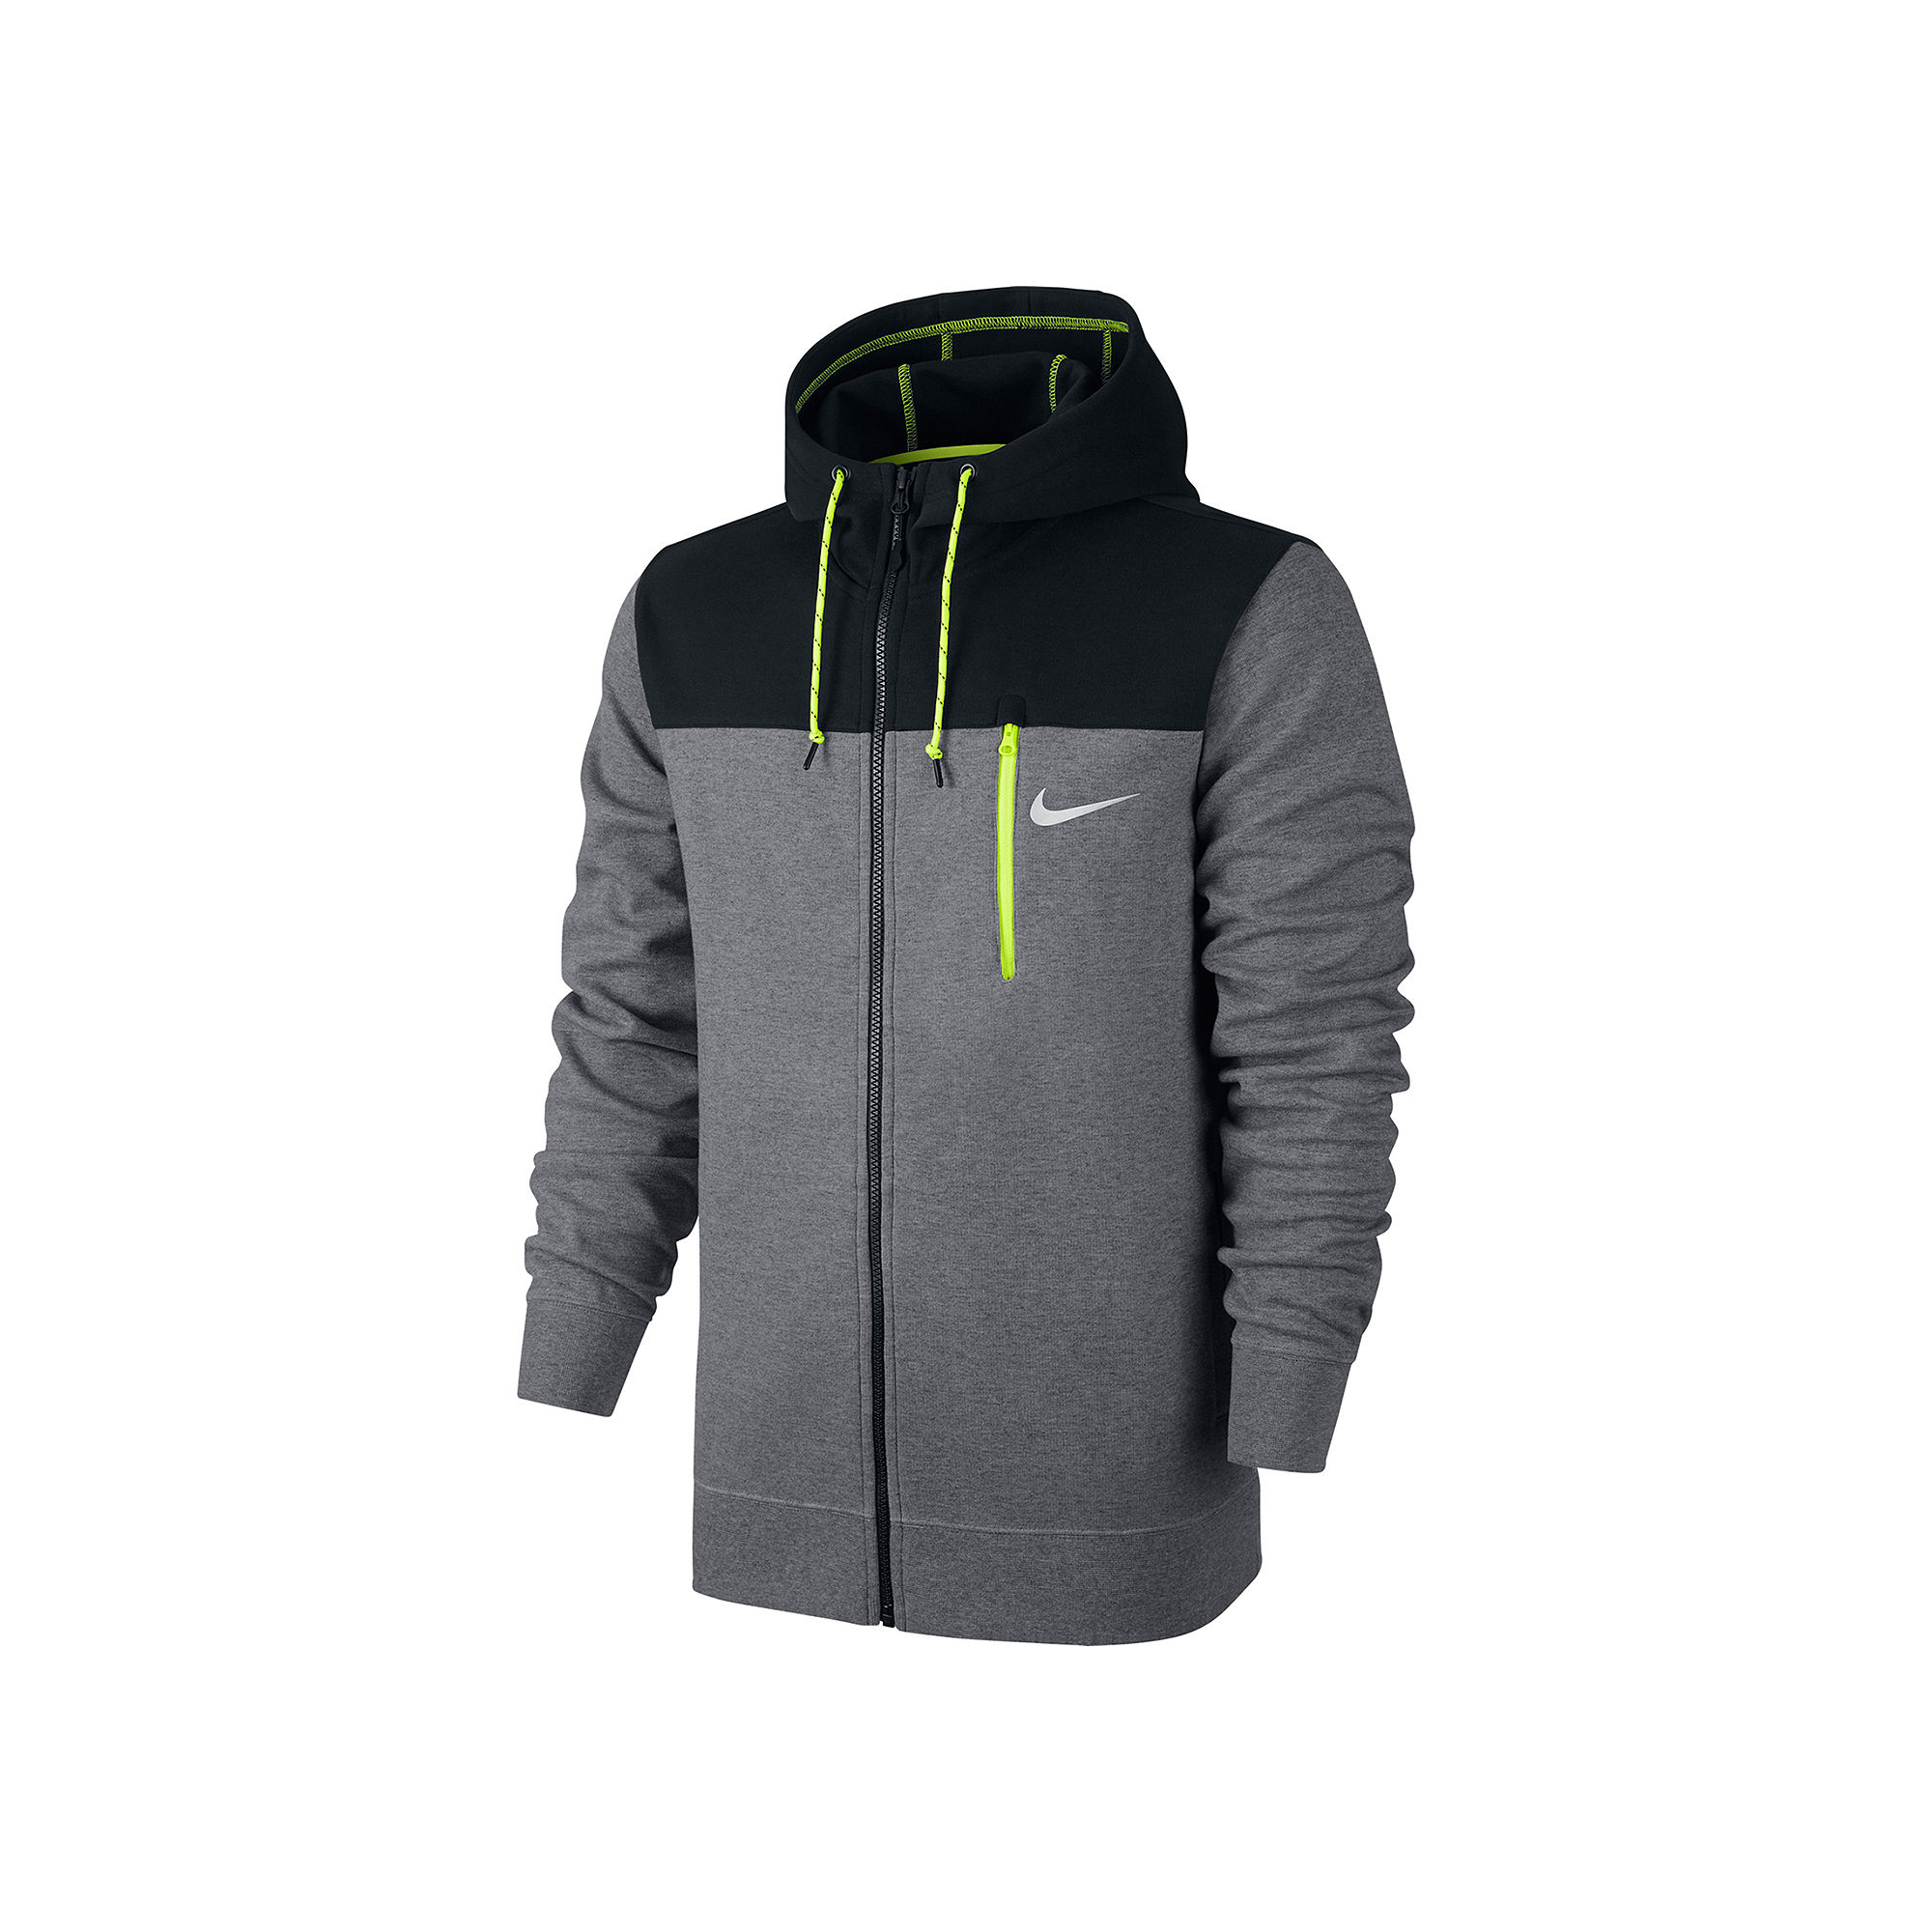 check out 9f177 b64b9 ... UPC 885179645418 product image for Nike AW15 Fleece Full-Zip Hoodie    upcitemdb.com ...